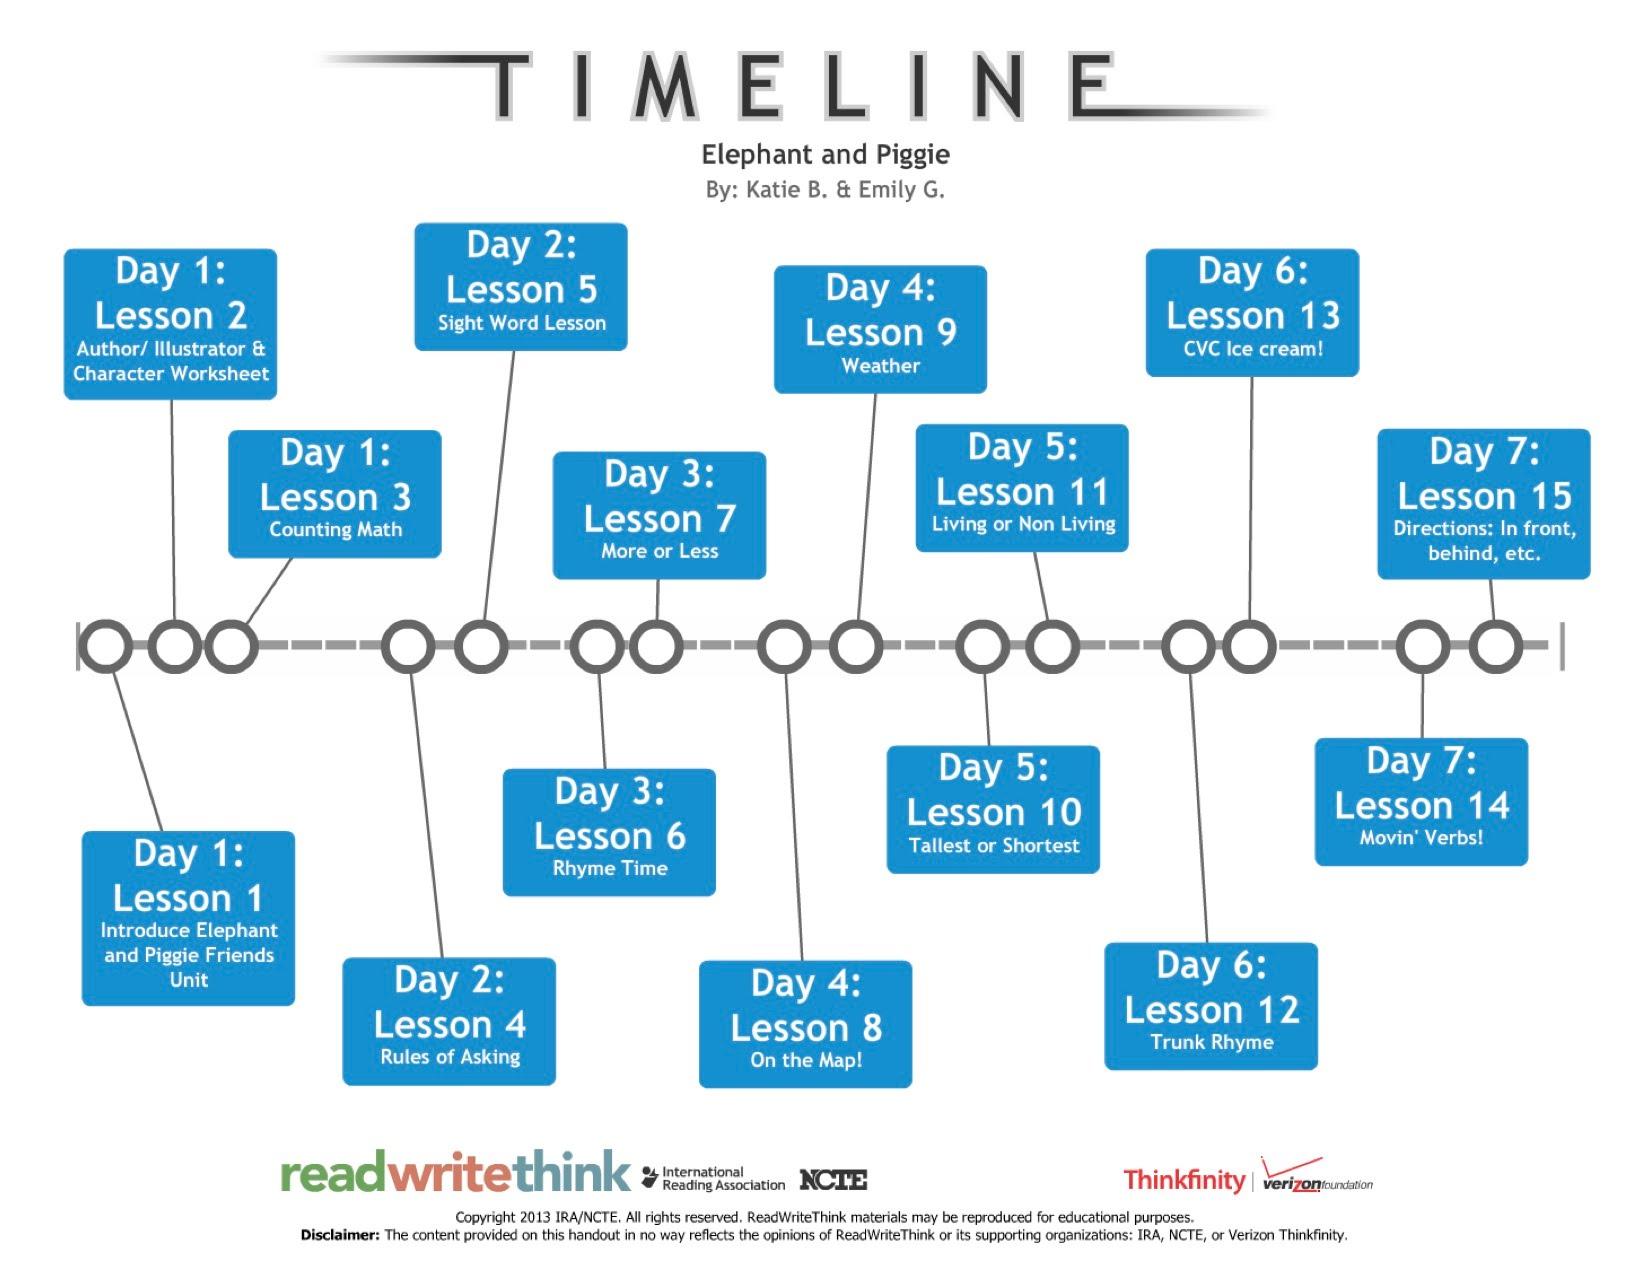 Timeline - Friends; Elephant and Piggie